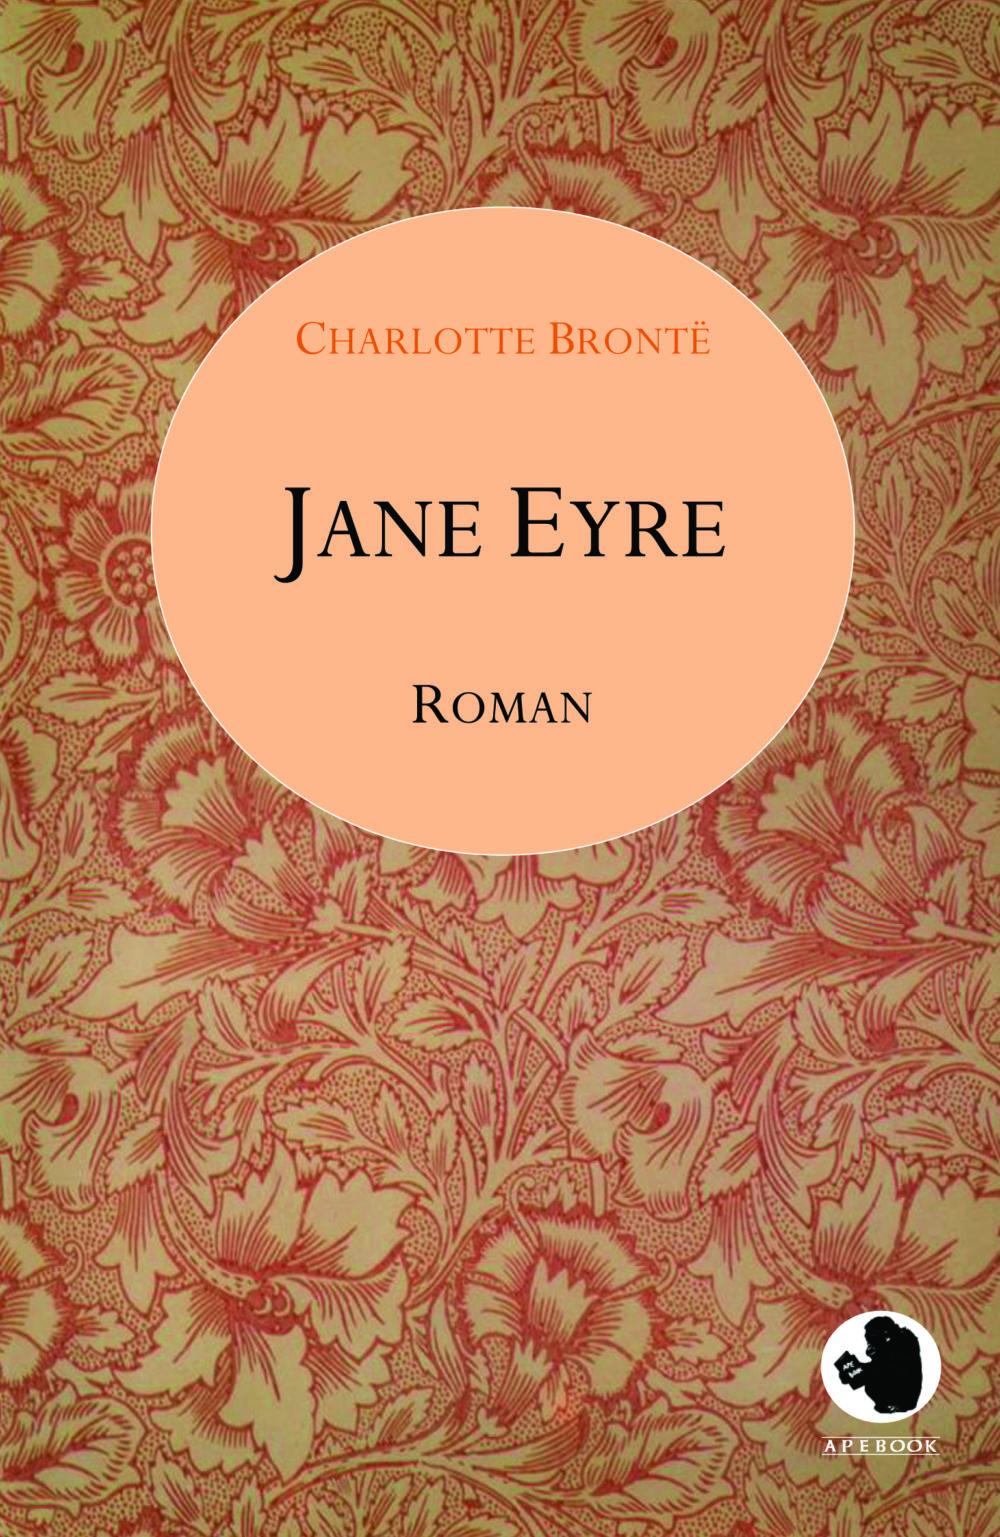 Charlotte Brontë: Jane Eyre (dt.)